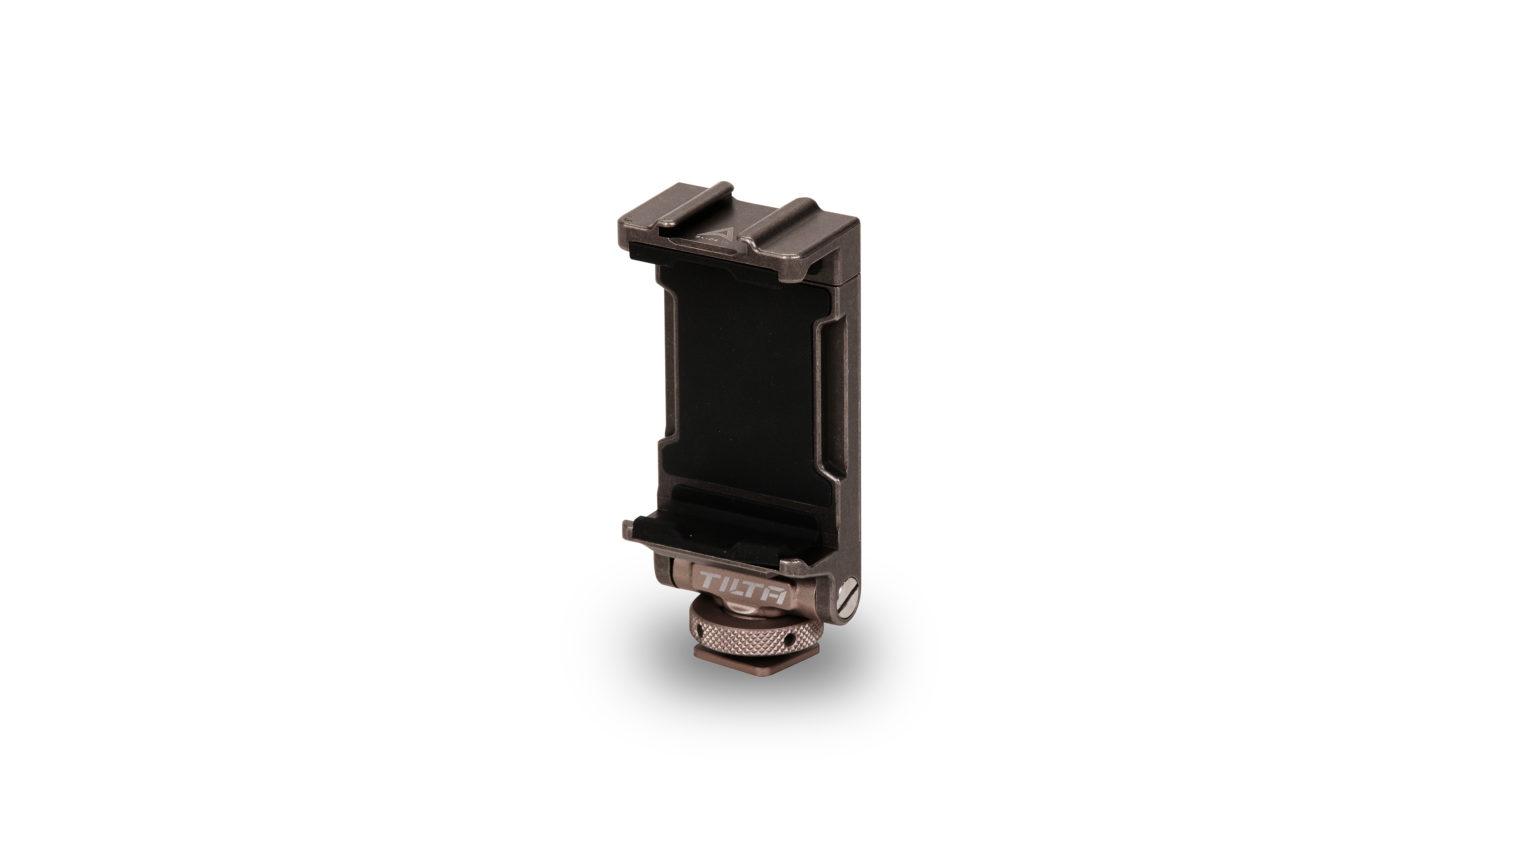 Tiltaing Adjustable Cold Shoe Phone Mounting Bracket